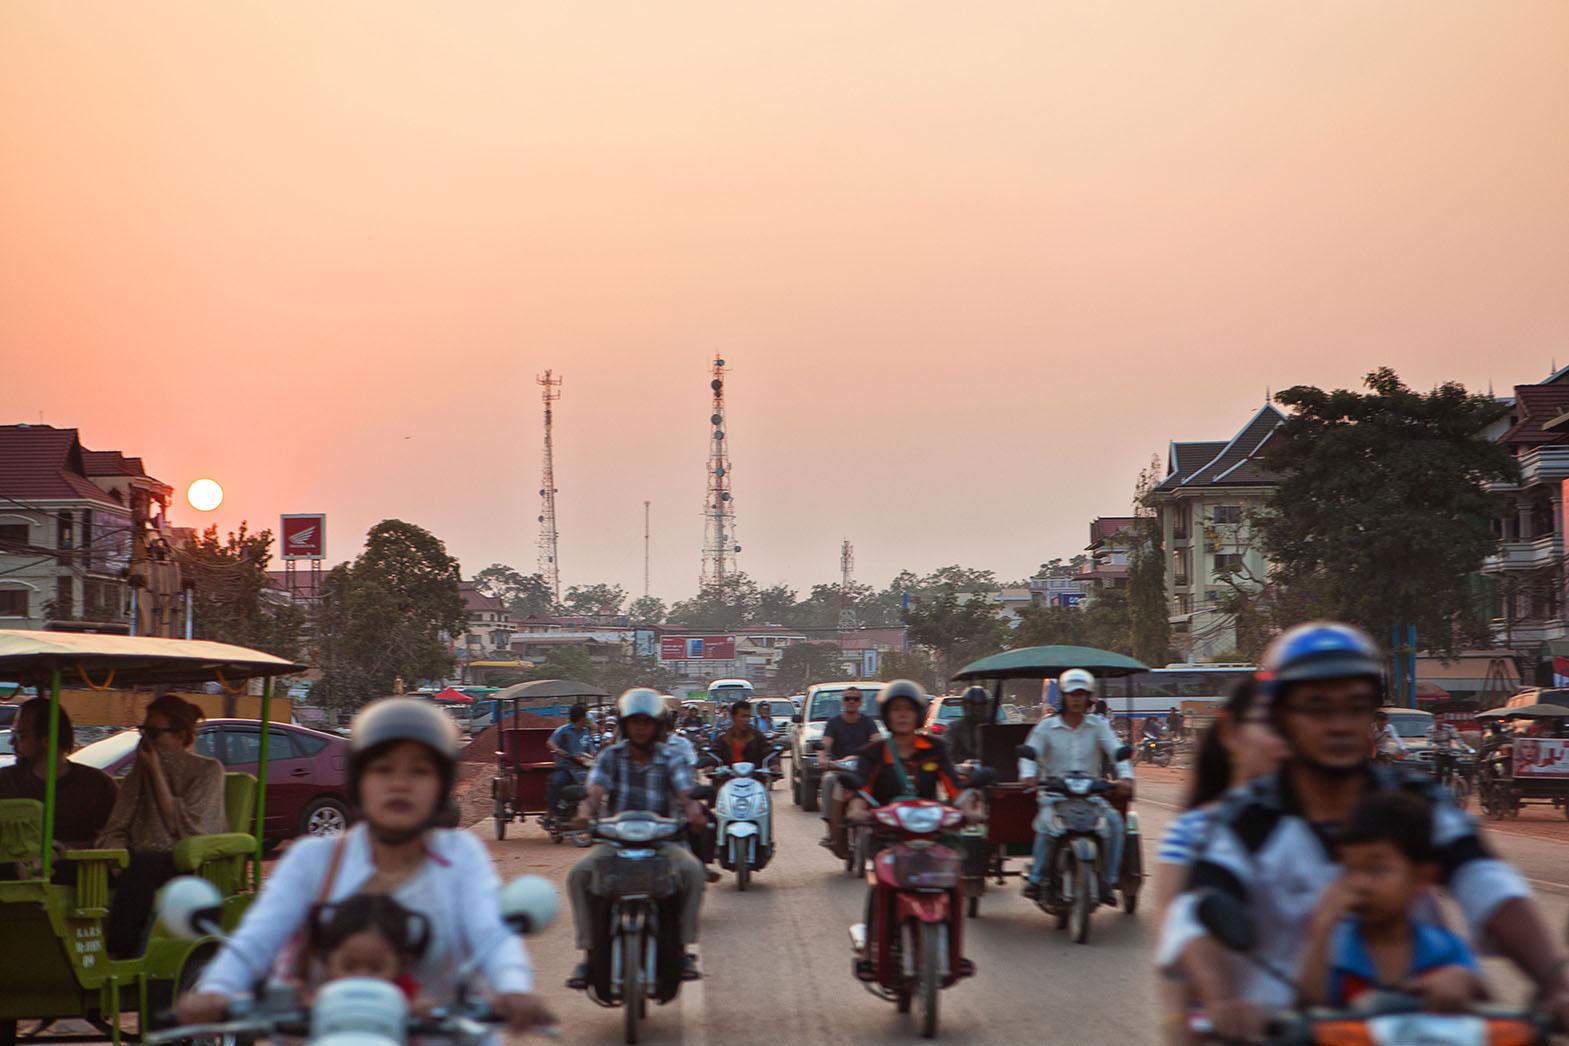 Motopeds_Cambodia-8.jpg